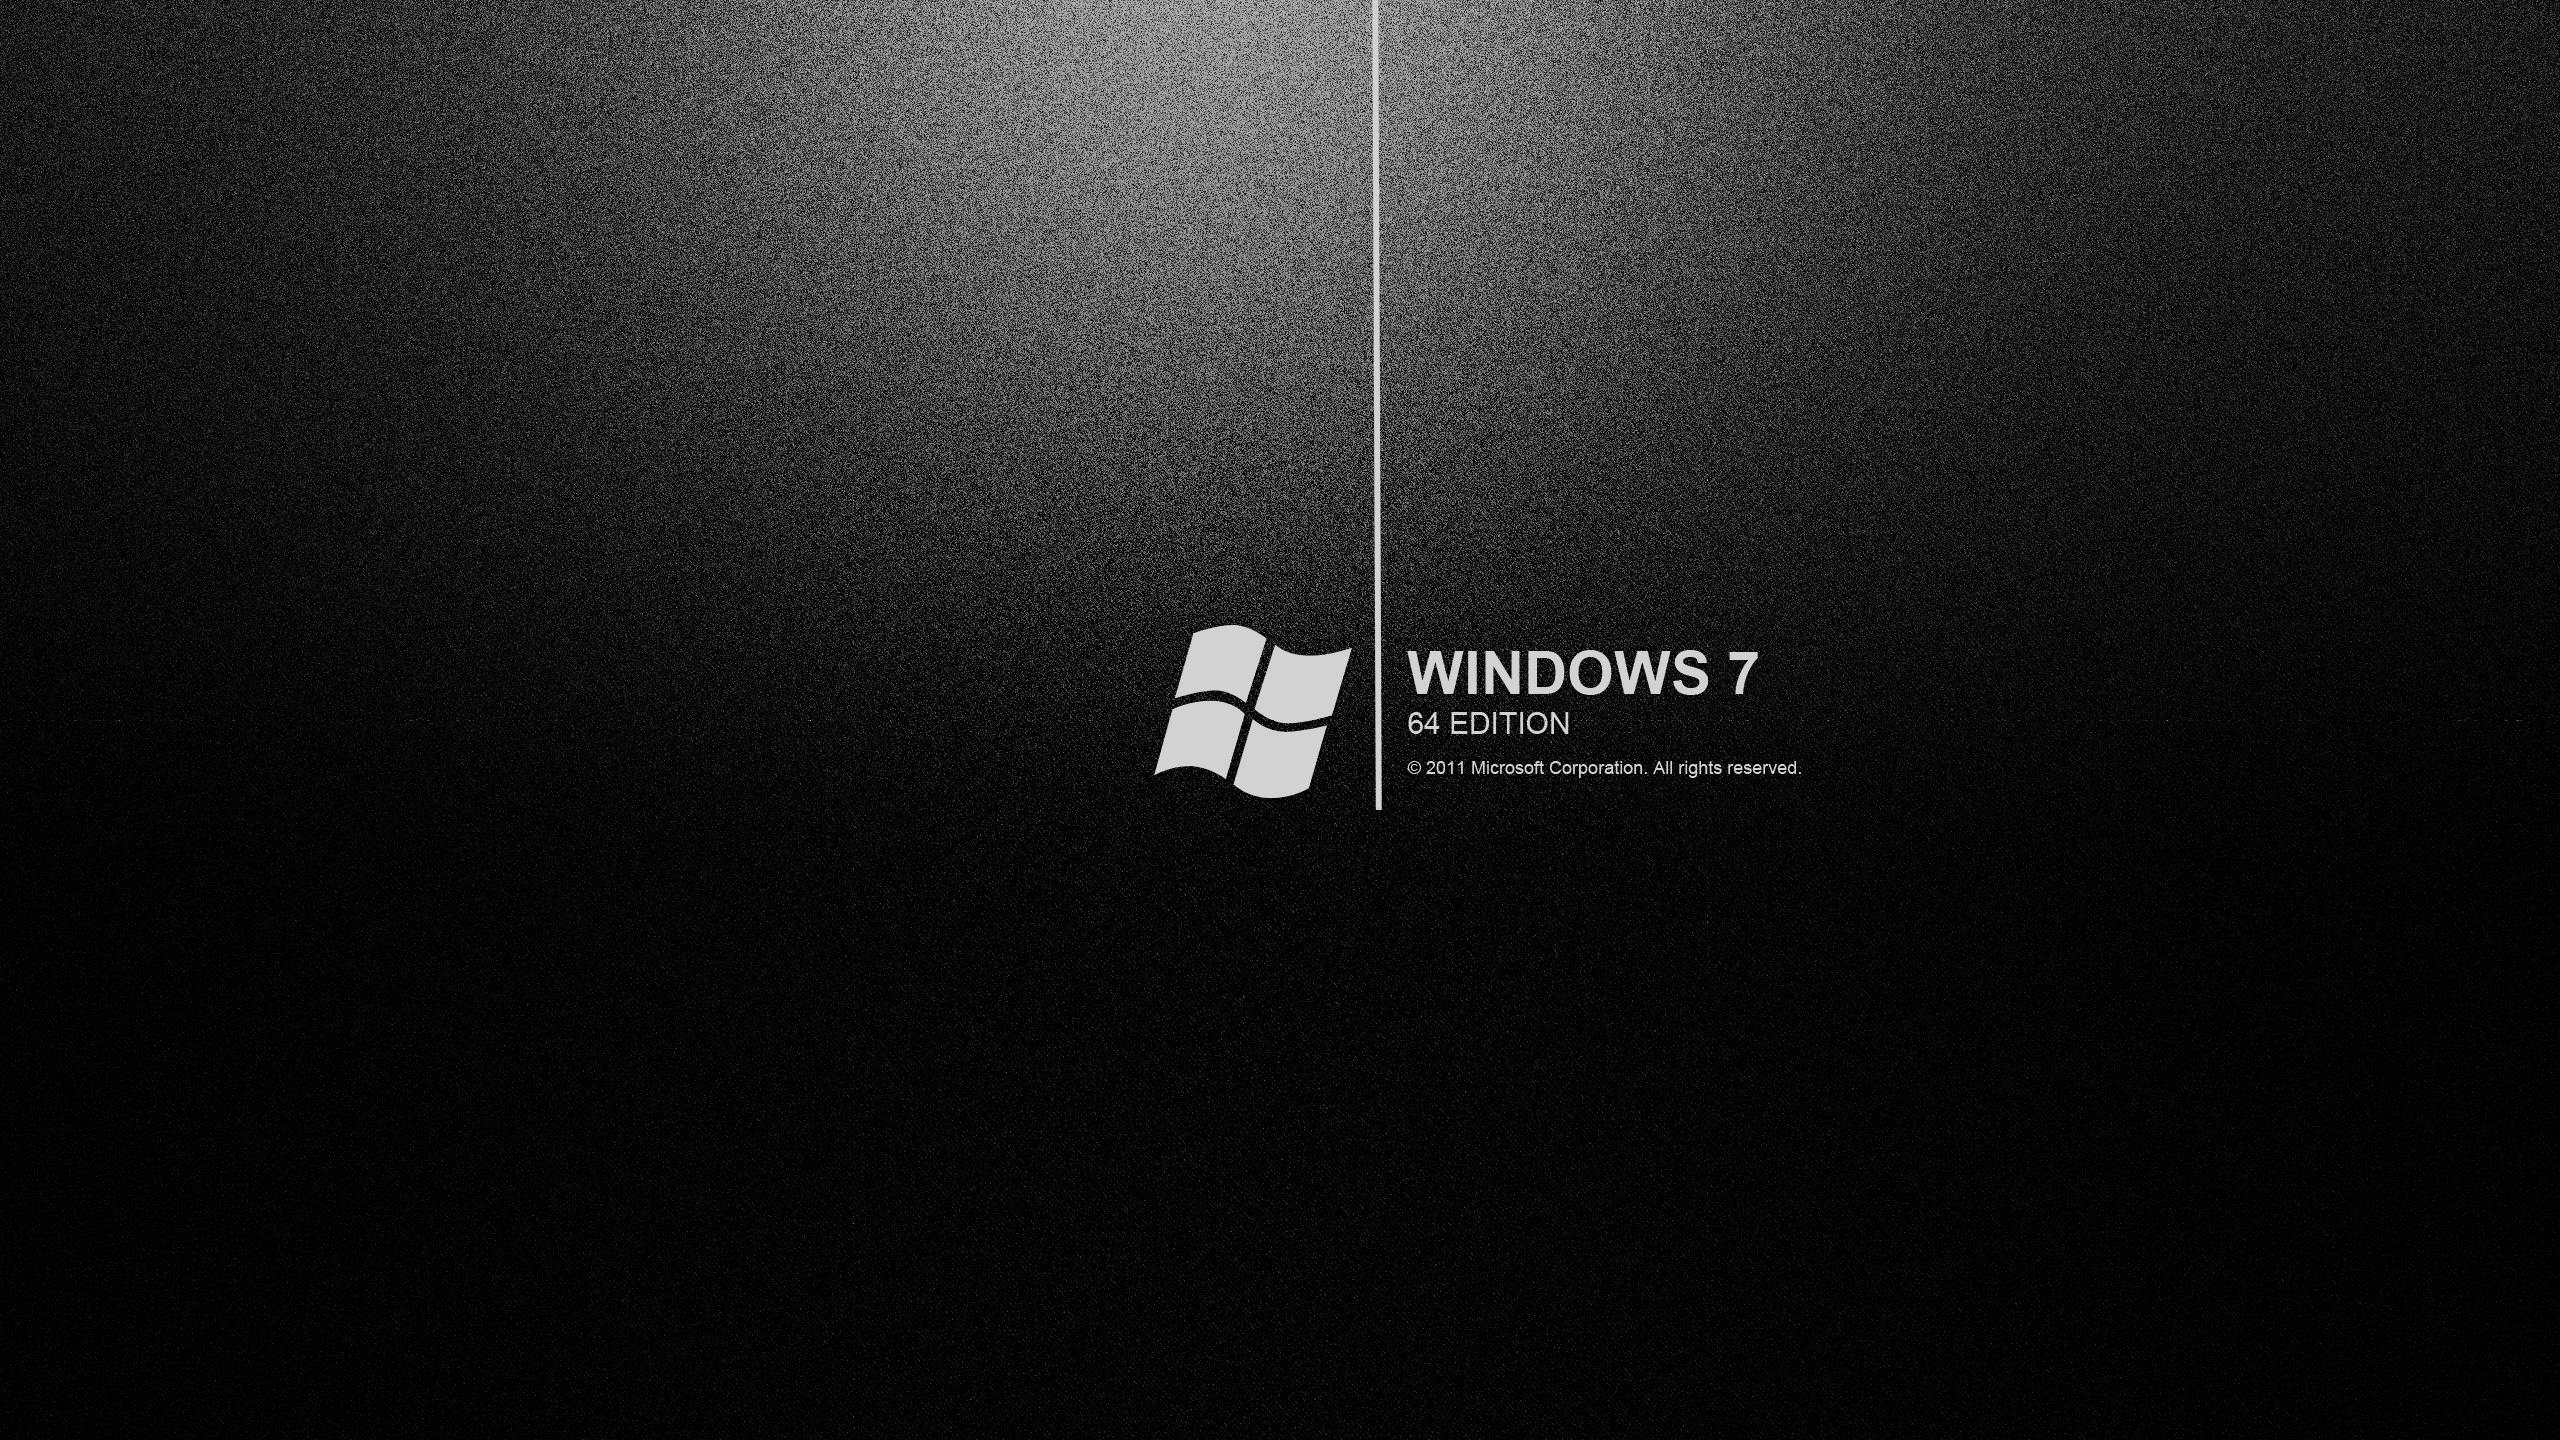 Windows Black Wallpaper 17 High Resolution Wallpaper